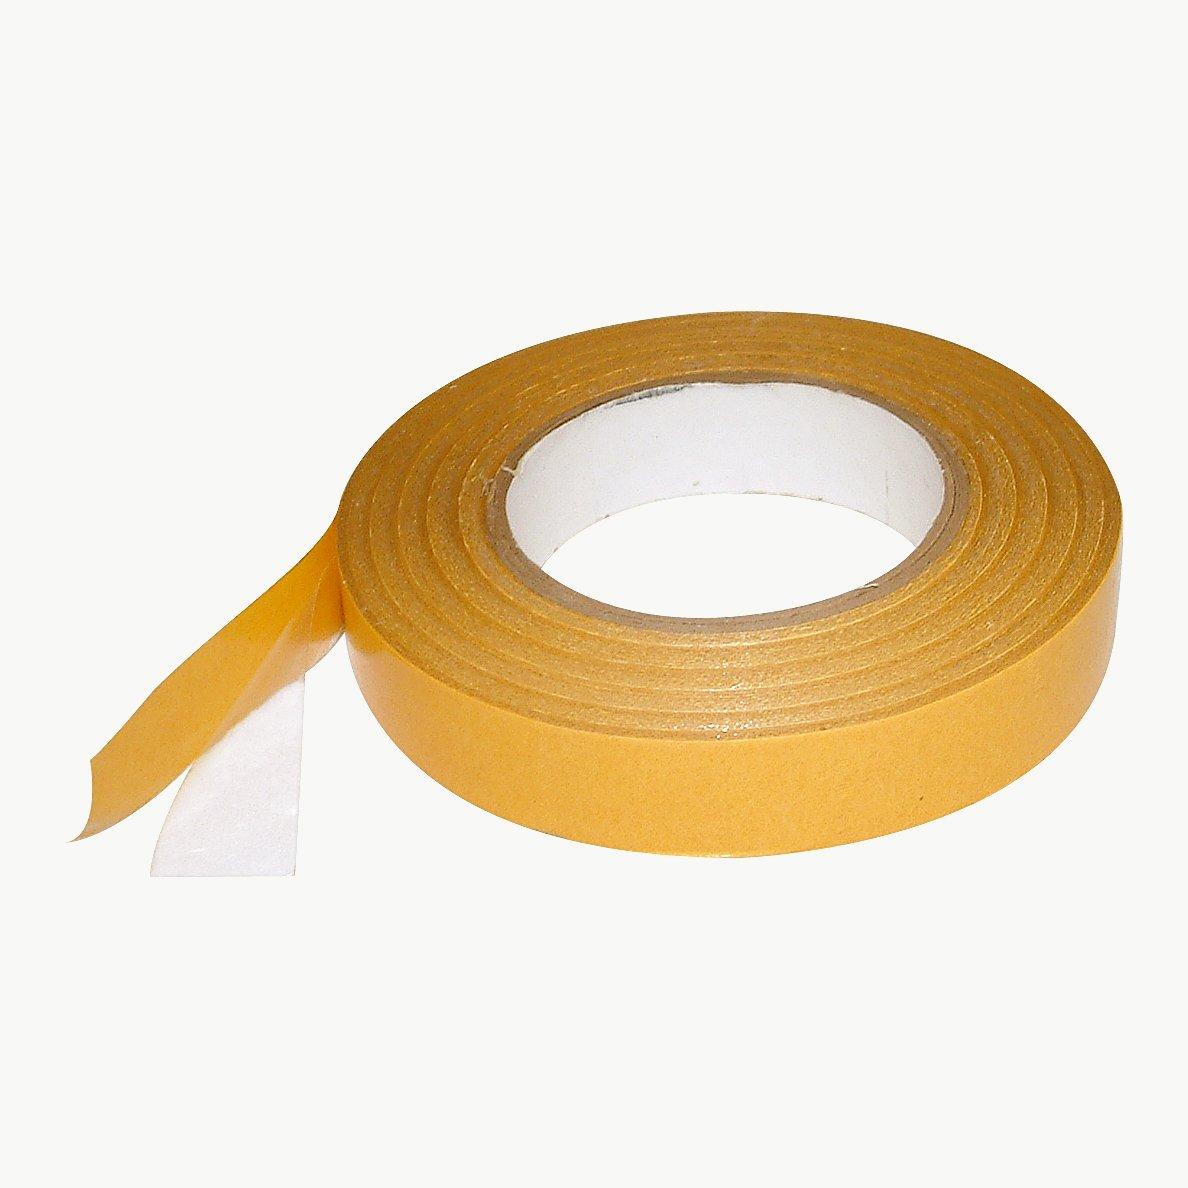 jvcc dc-4109rs Película de revestimiento de doble doble doble cinta [adhesivo acrílico] (60 metros de largo), Blanco 89308d